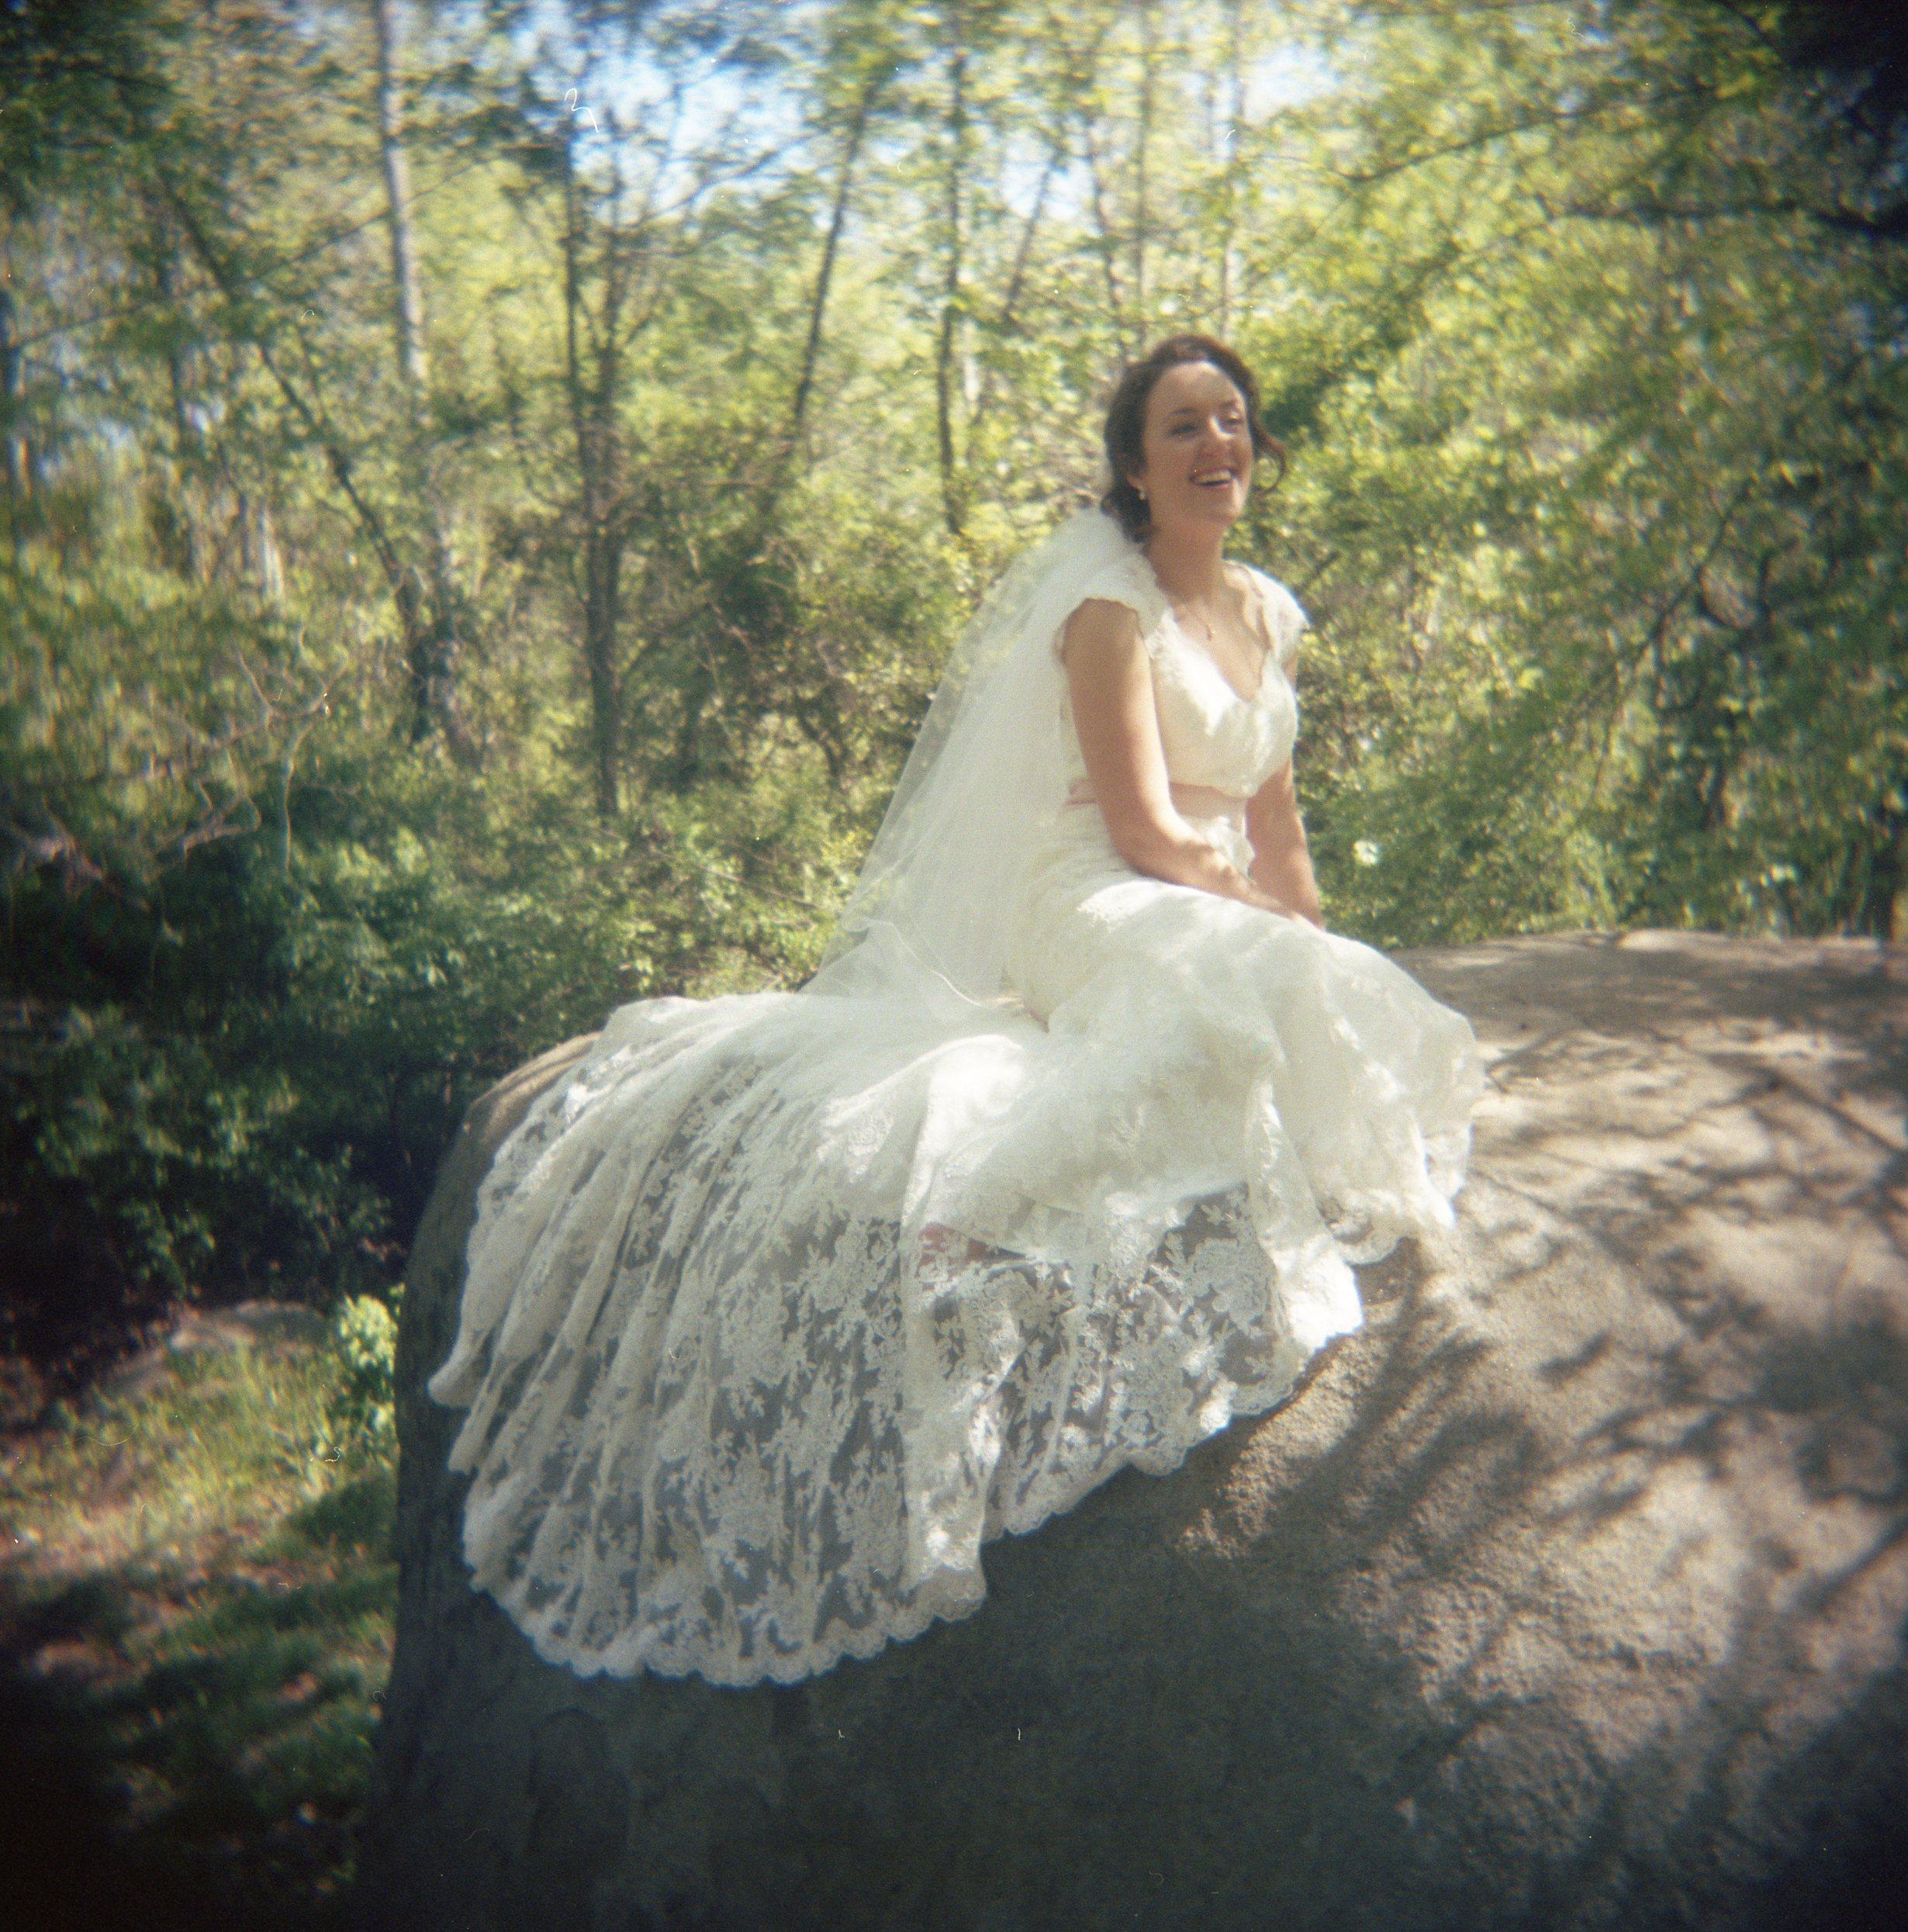 wedding_holgas021.jpg